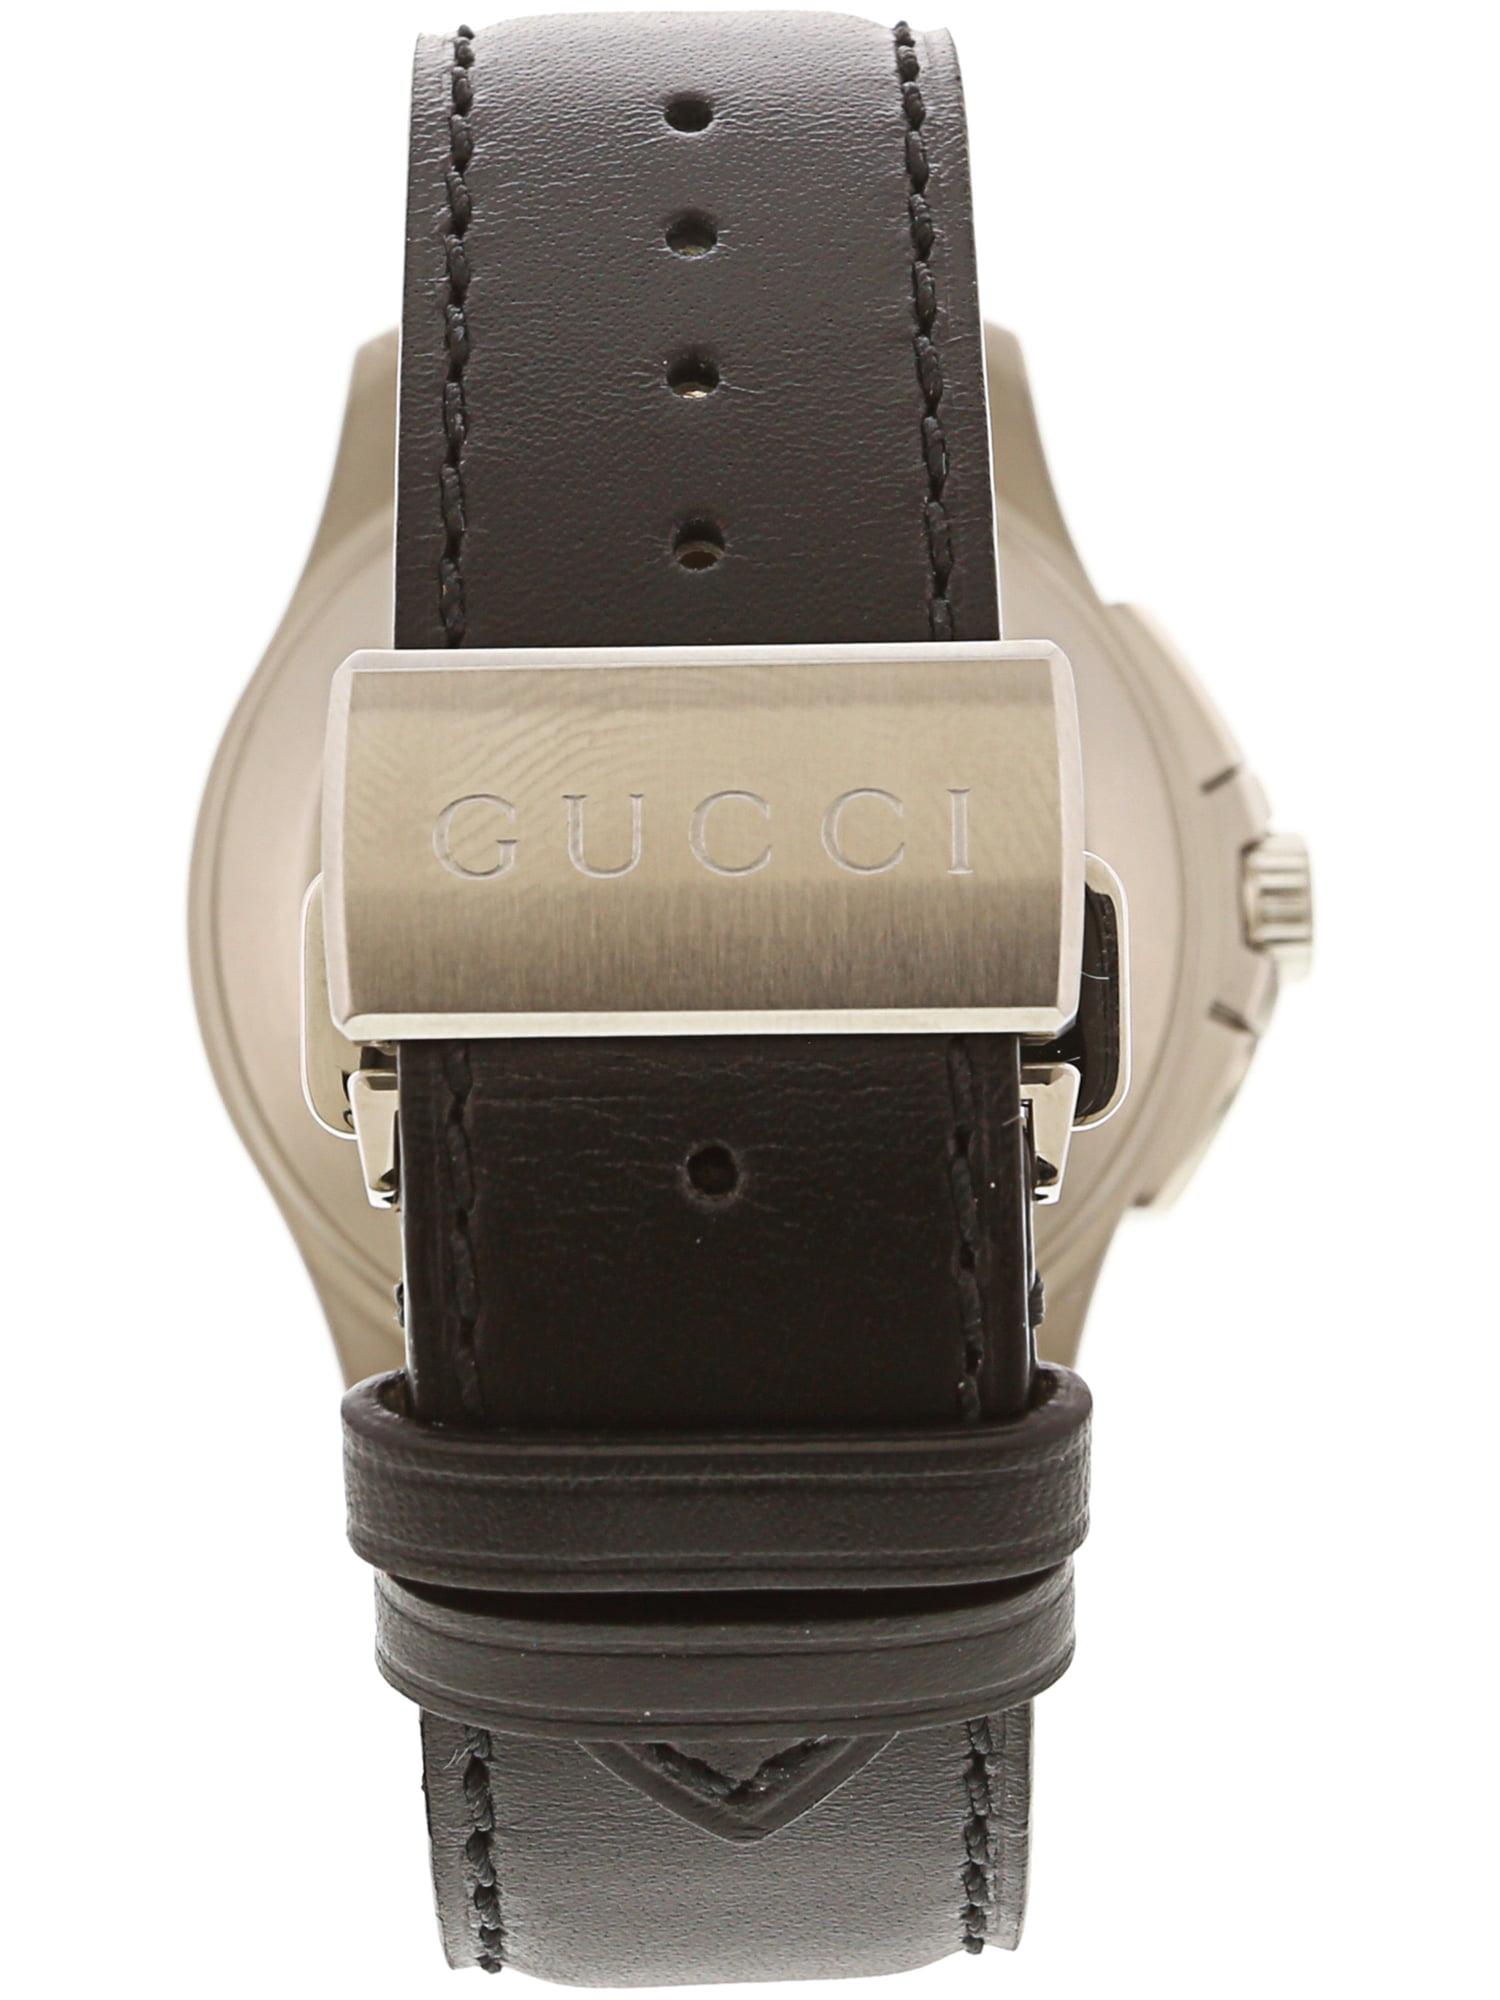 9ba0331a7d9 Gucci - Men s G-Timeless YA126265 Silver Leather Swiss Automatic Dress Watch  - Walmart.com